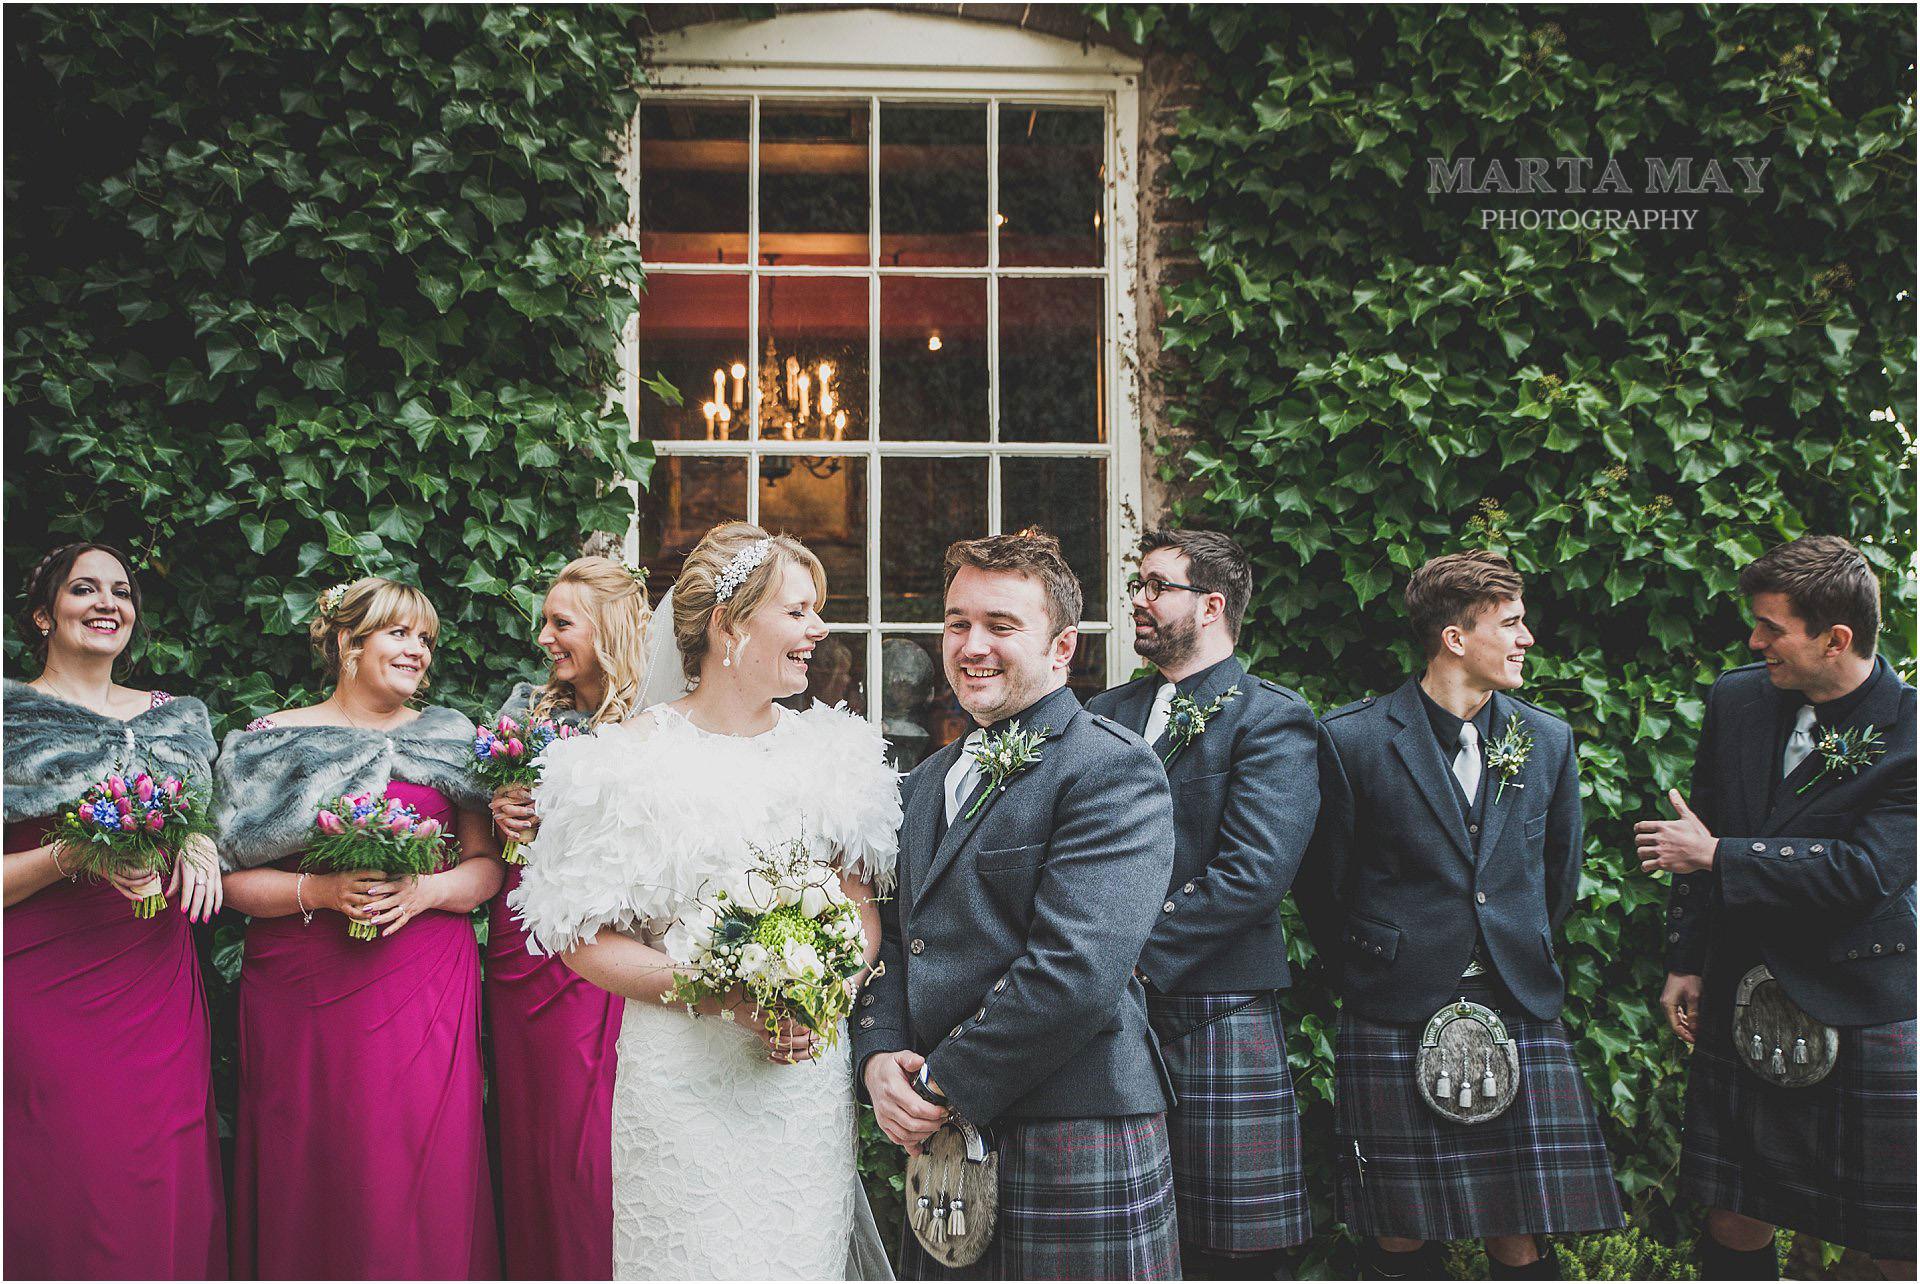 Scottish English wedding at Dewsall Court Herefordshire